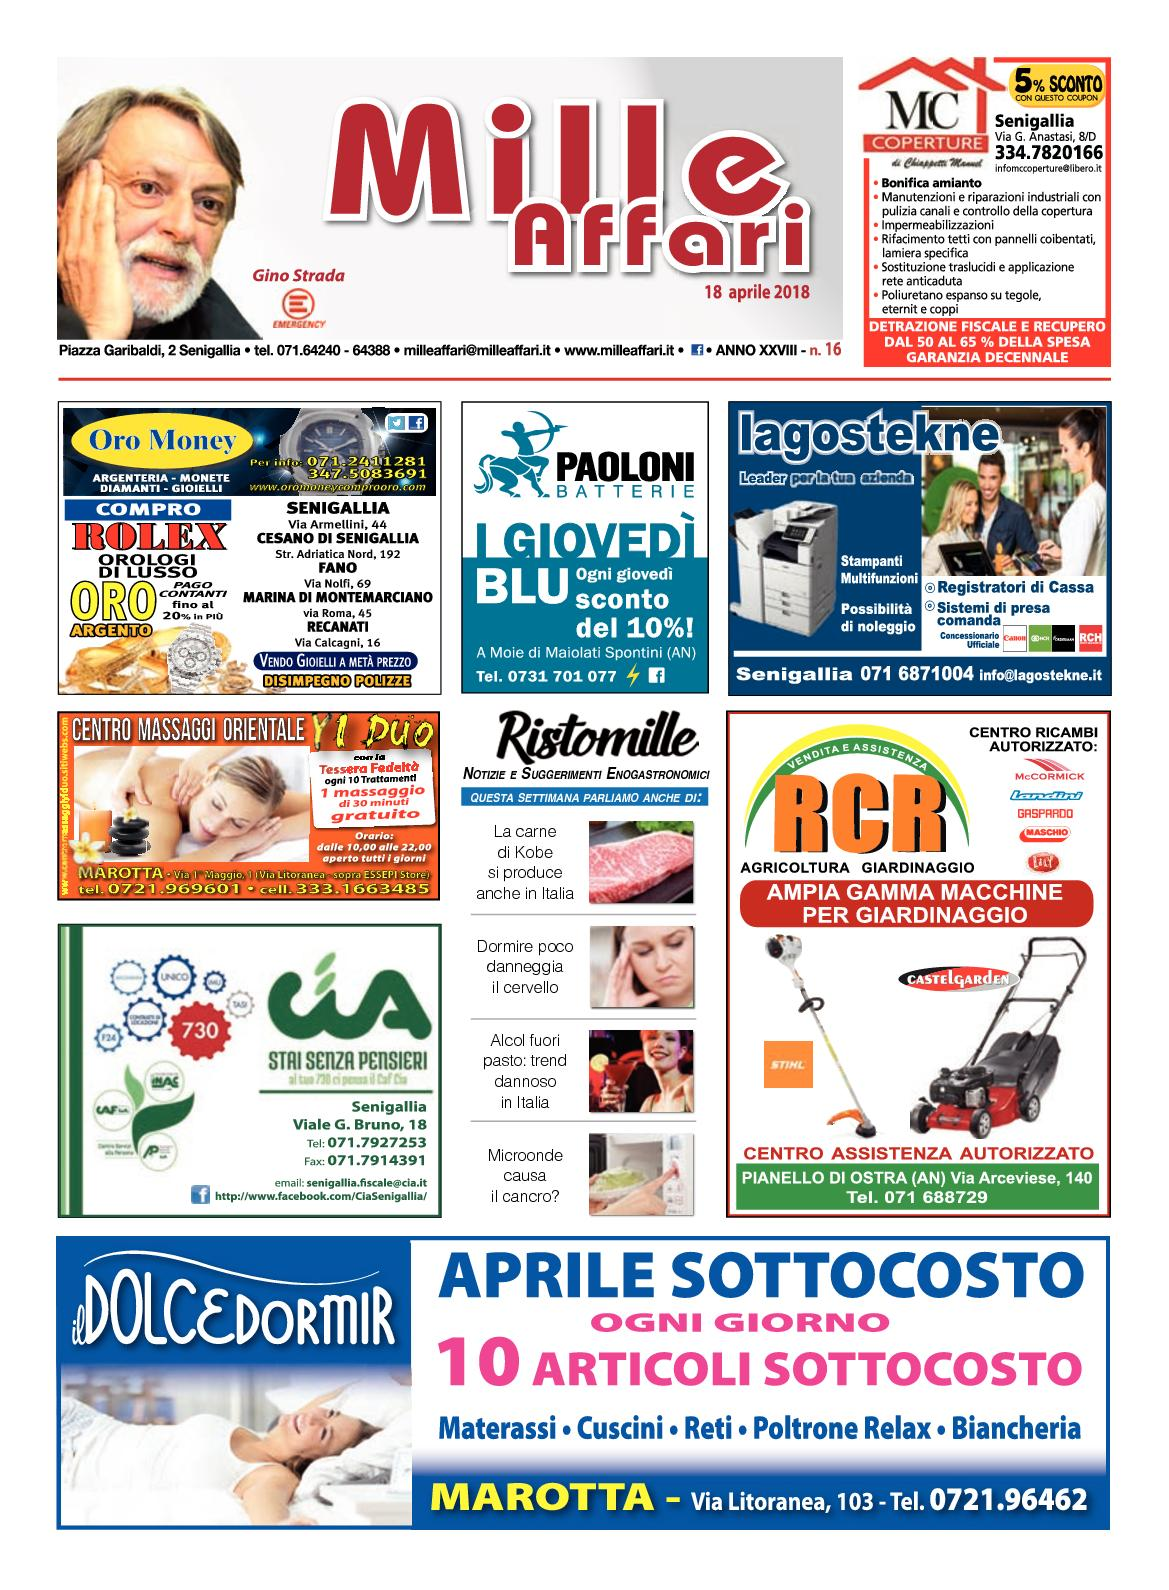 Calaméo - Milleaffari N° 16 del 18.04.18 f6c2174abeb